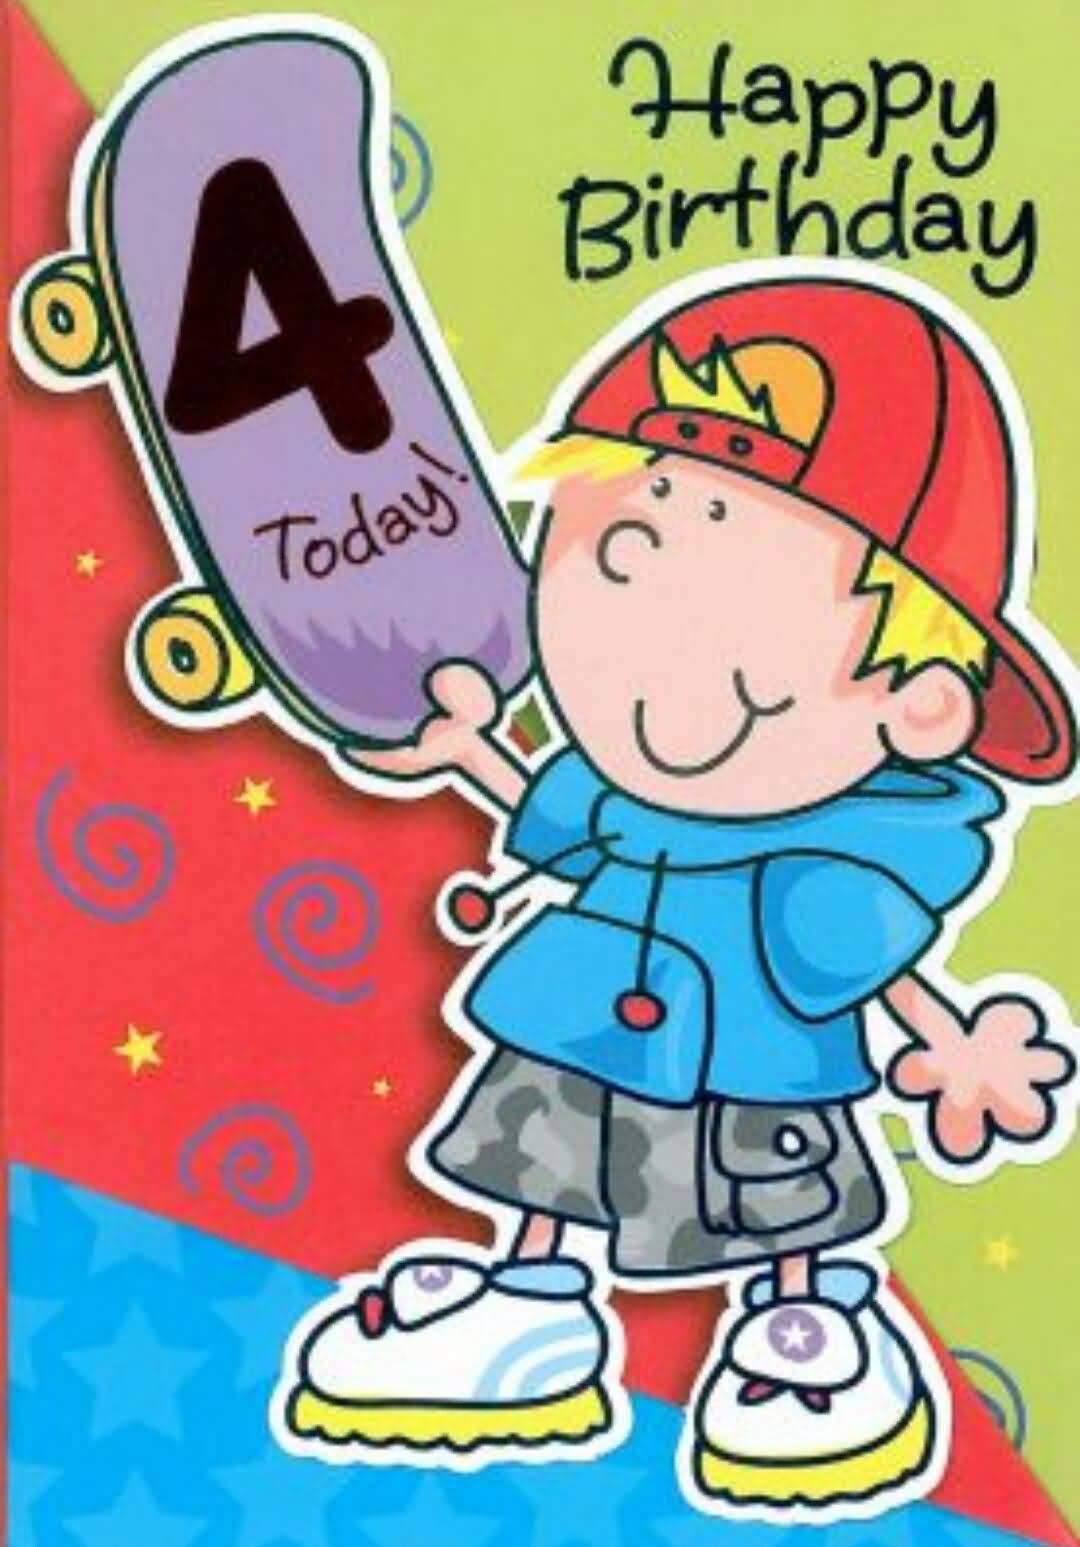 Happy Birthday Cool Boy 4th Birthday Wishes